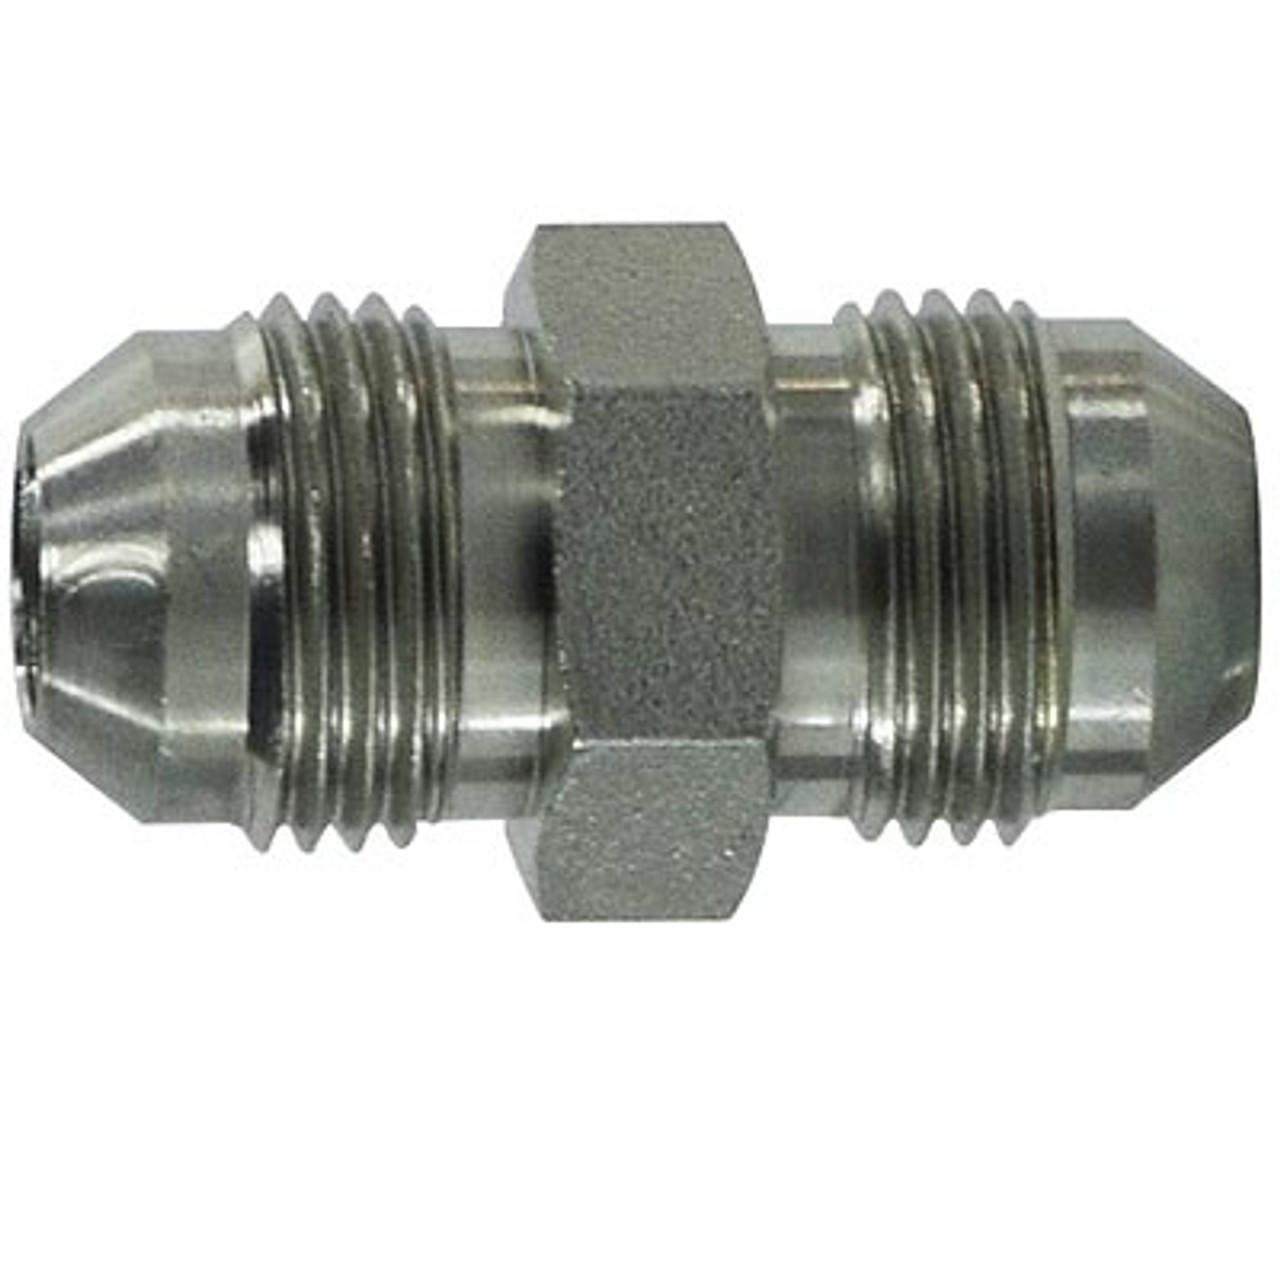 9 16 18 JIC Tube Union Steel Hydraulic Adapter